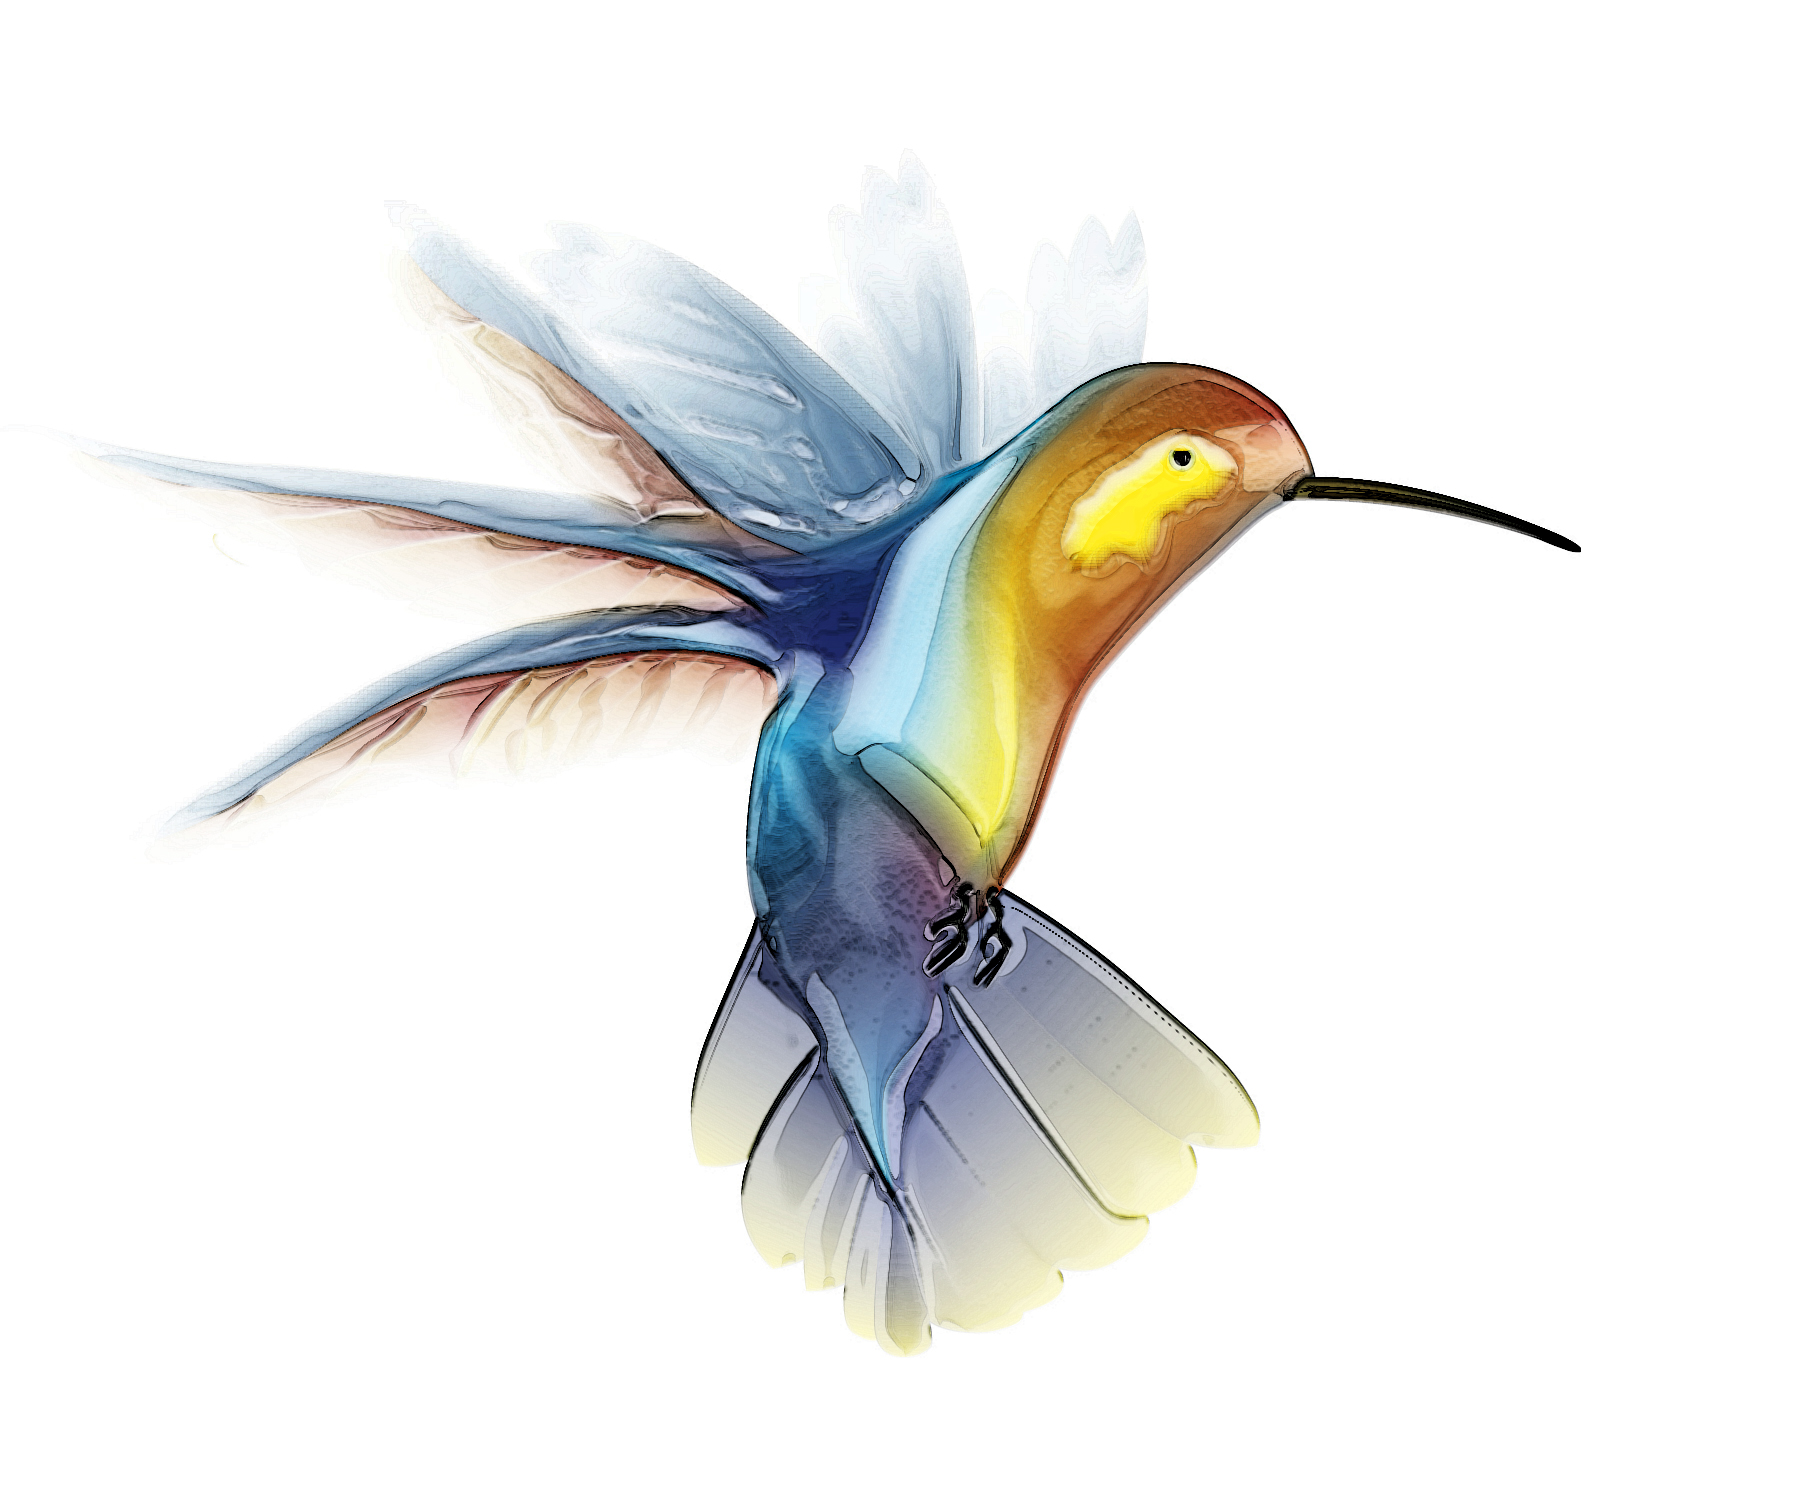 Hummingbird Image-Hummingbird Image-18